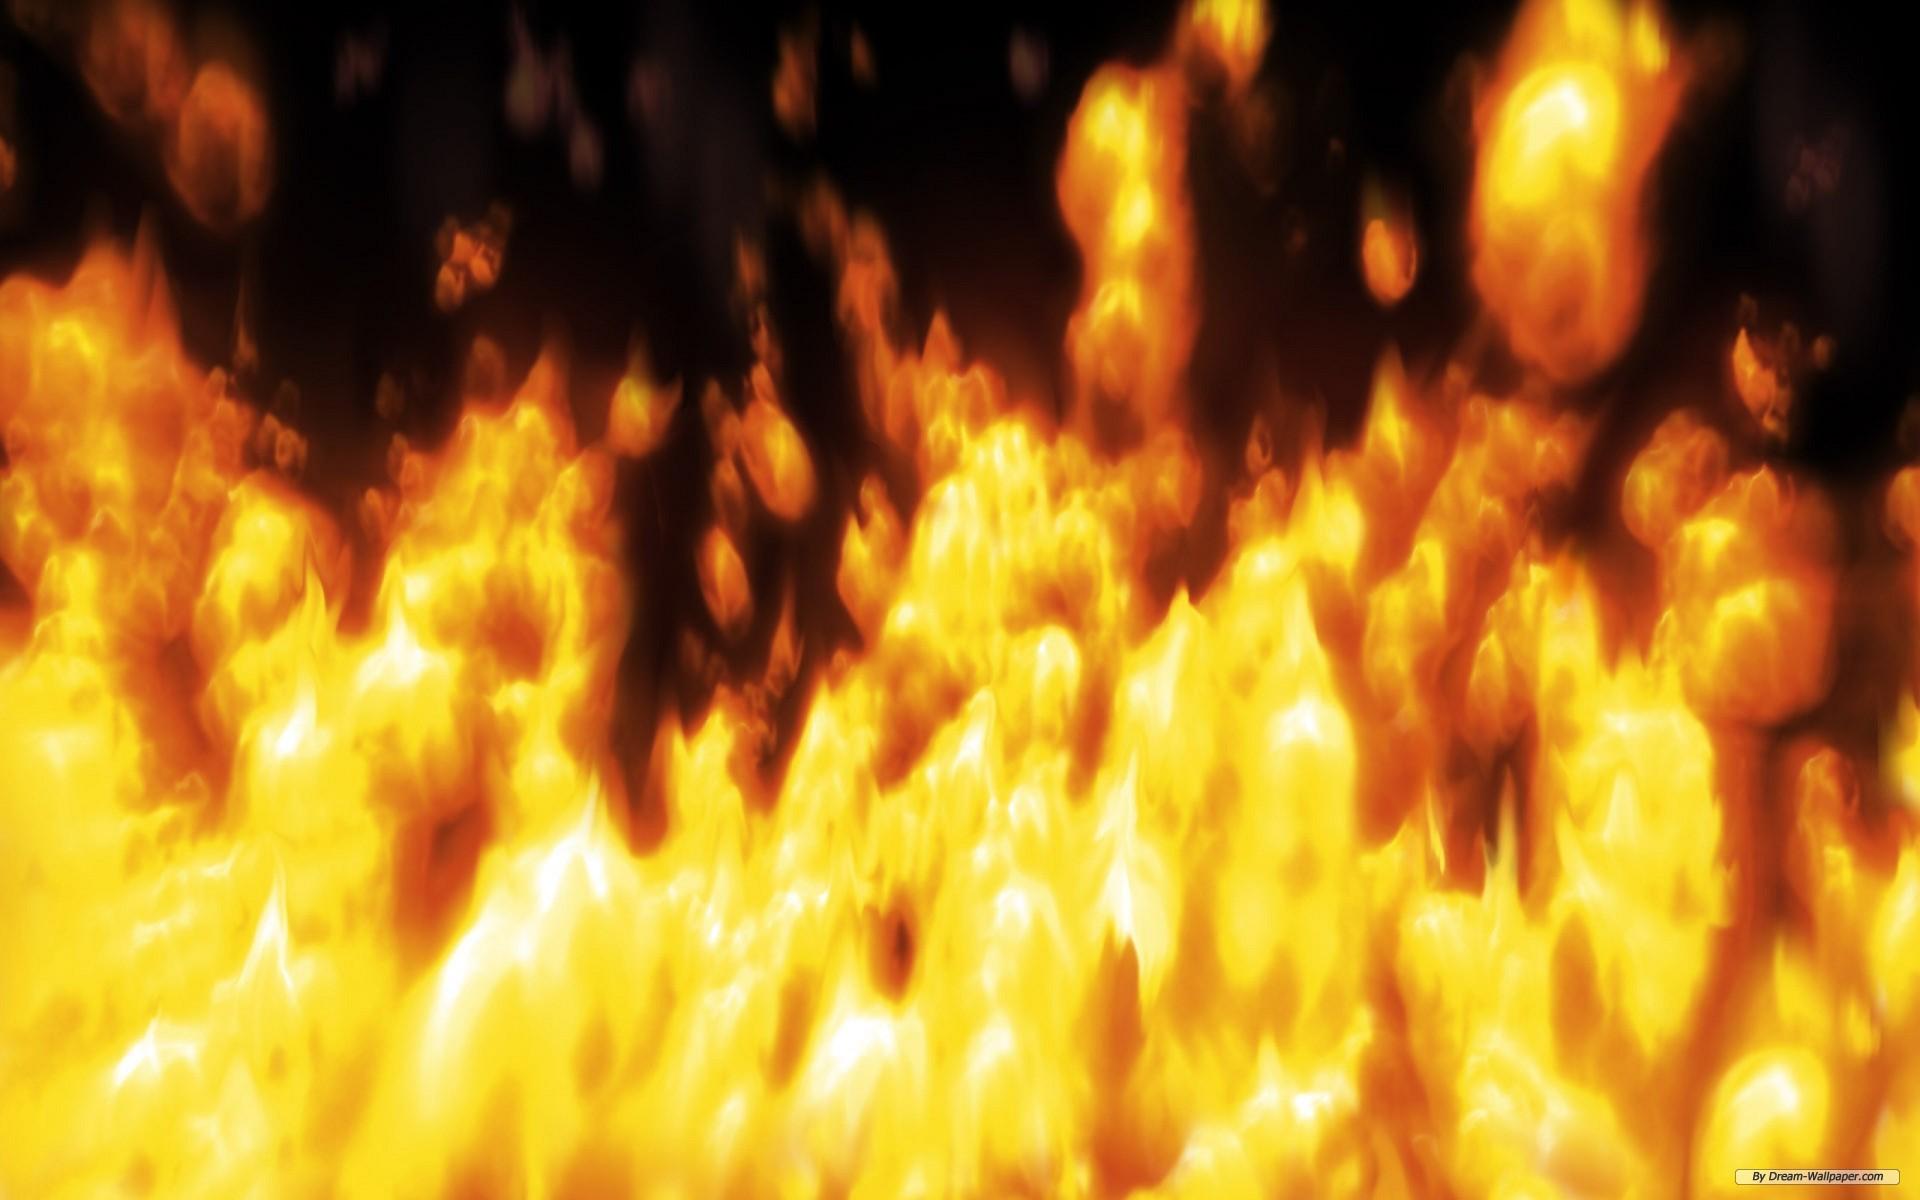 wallpaper flame backgrounds desktop image photography close 1920x1200